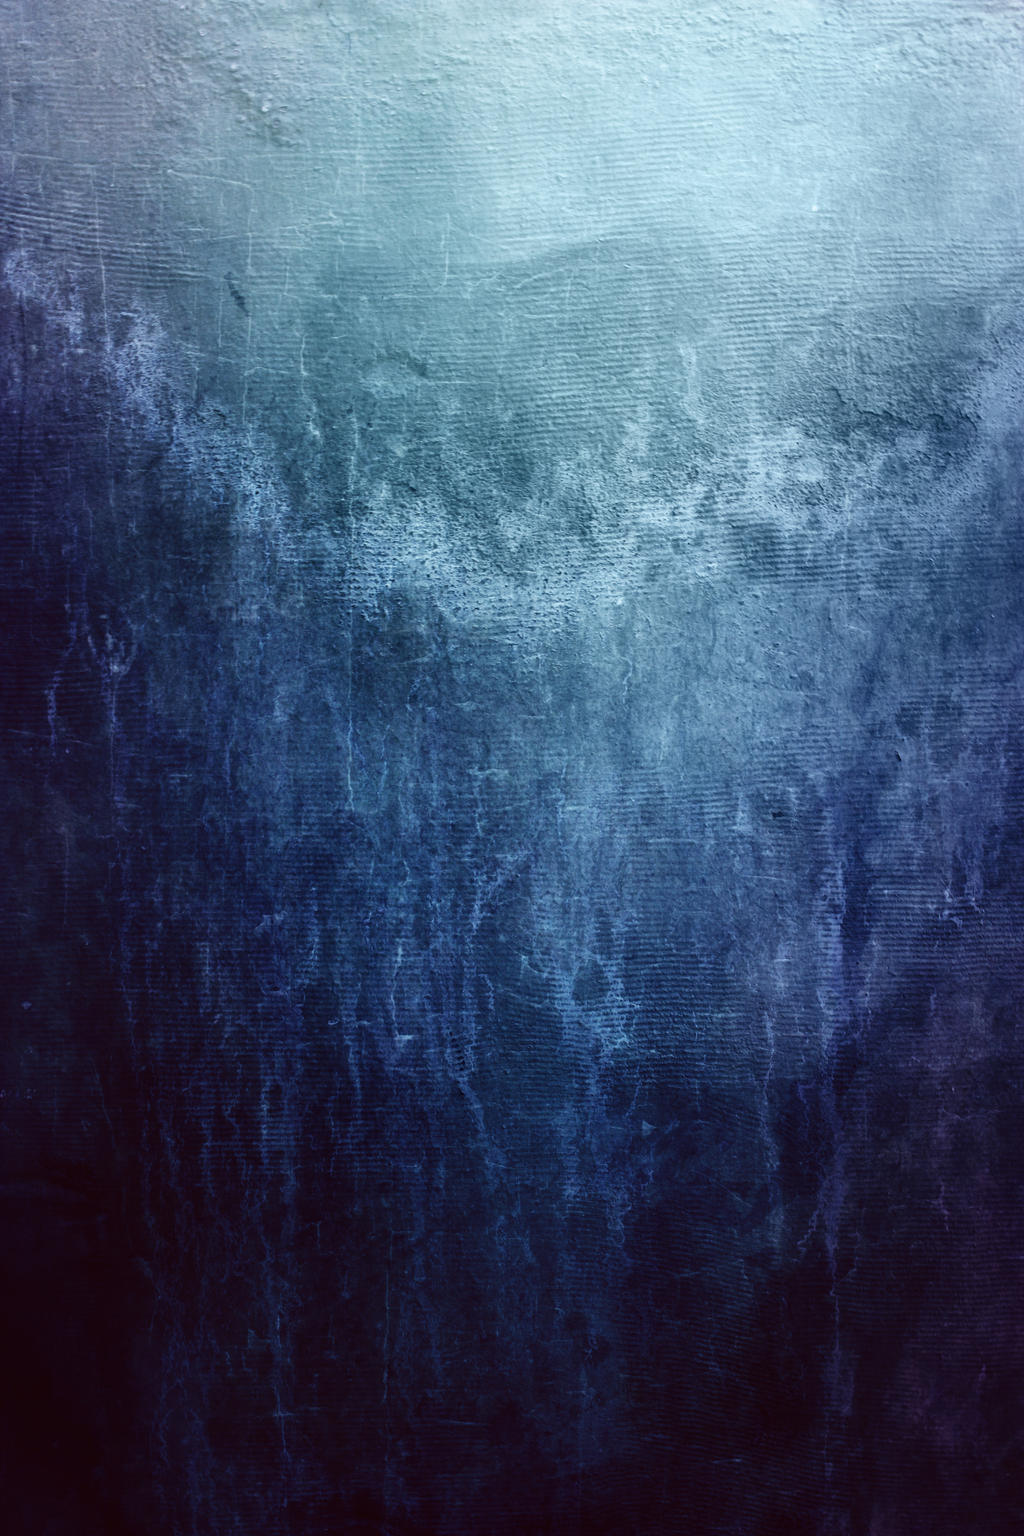 Digital Art Texture 67 by mercurycode